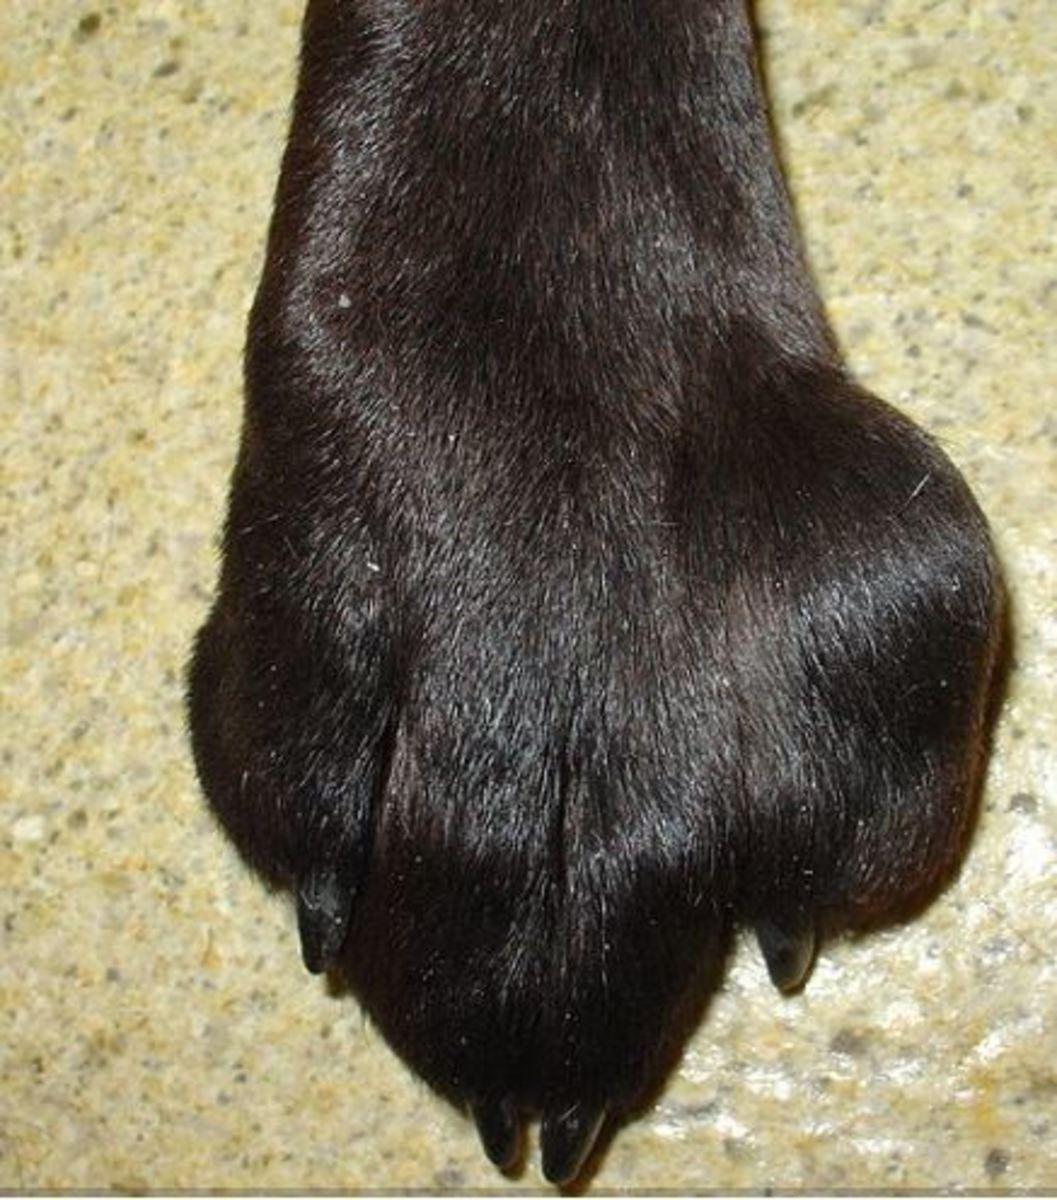 Mast cell tumor on dog's toe